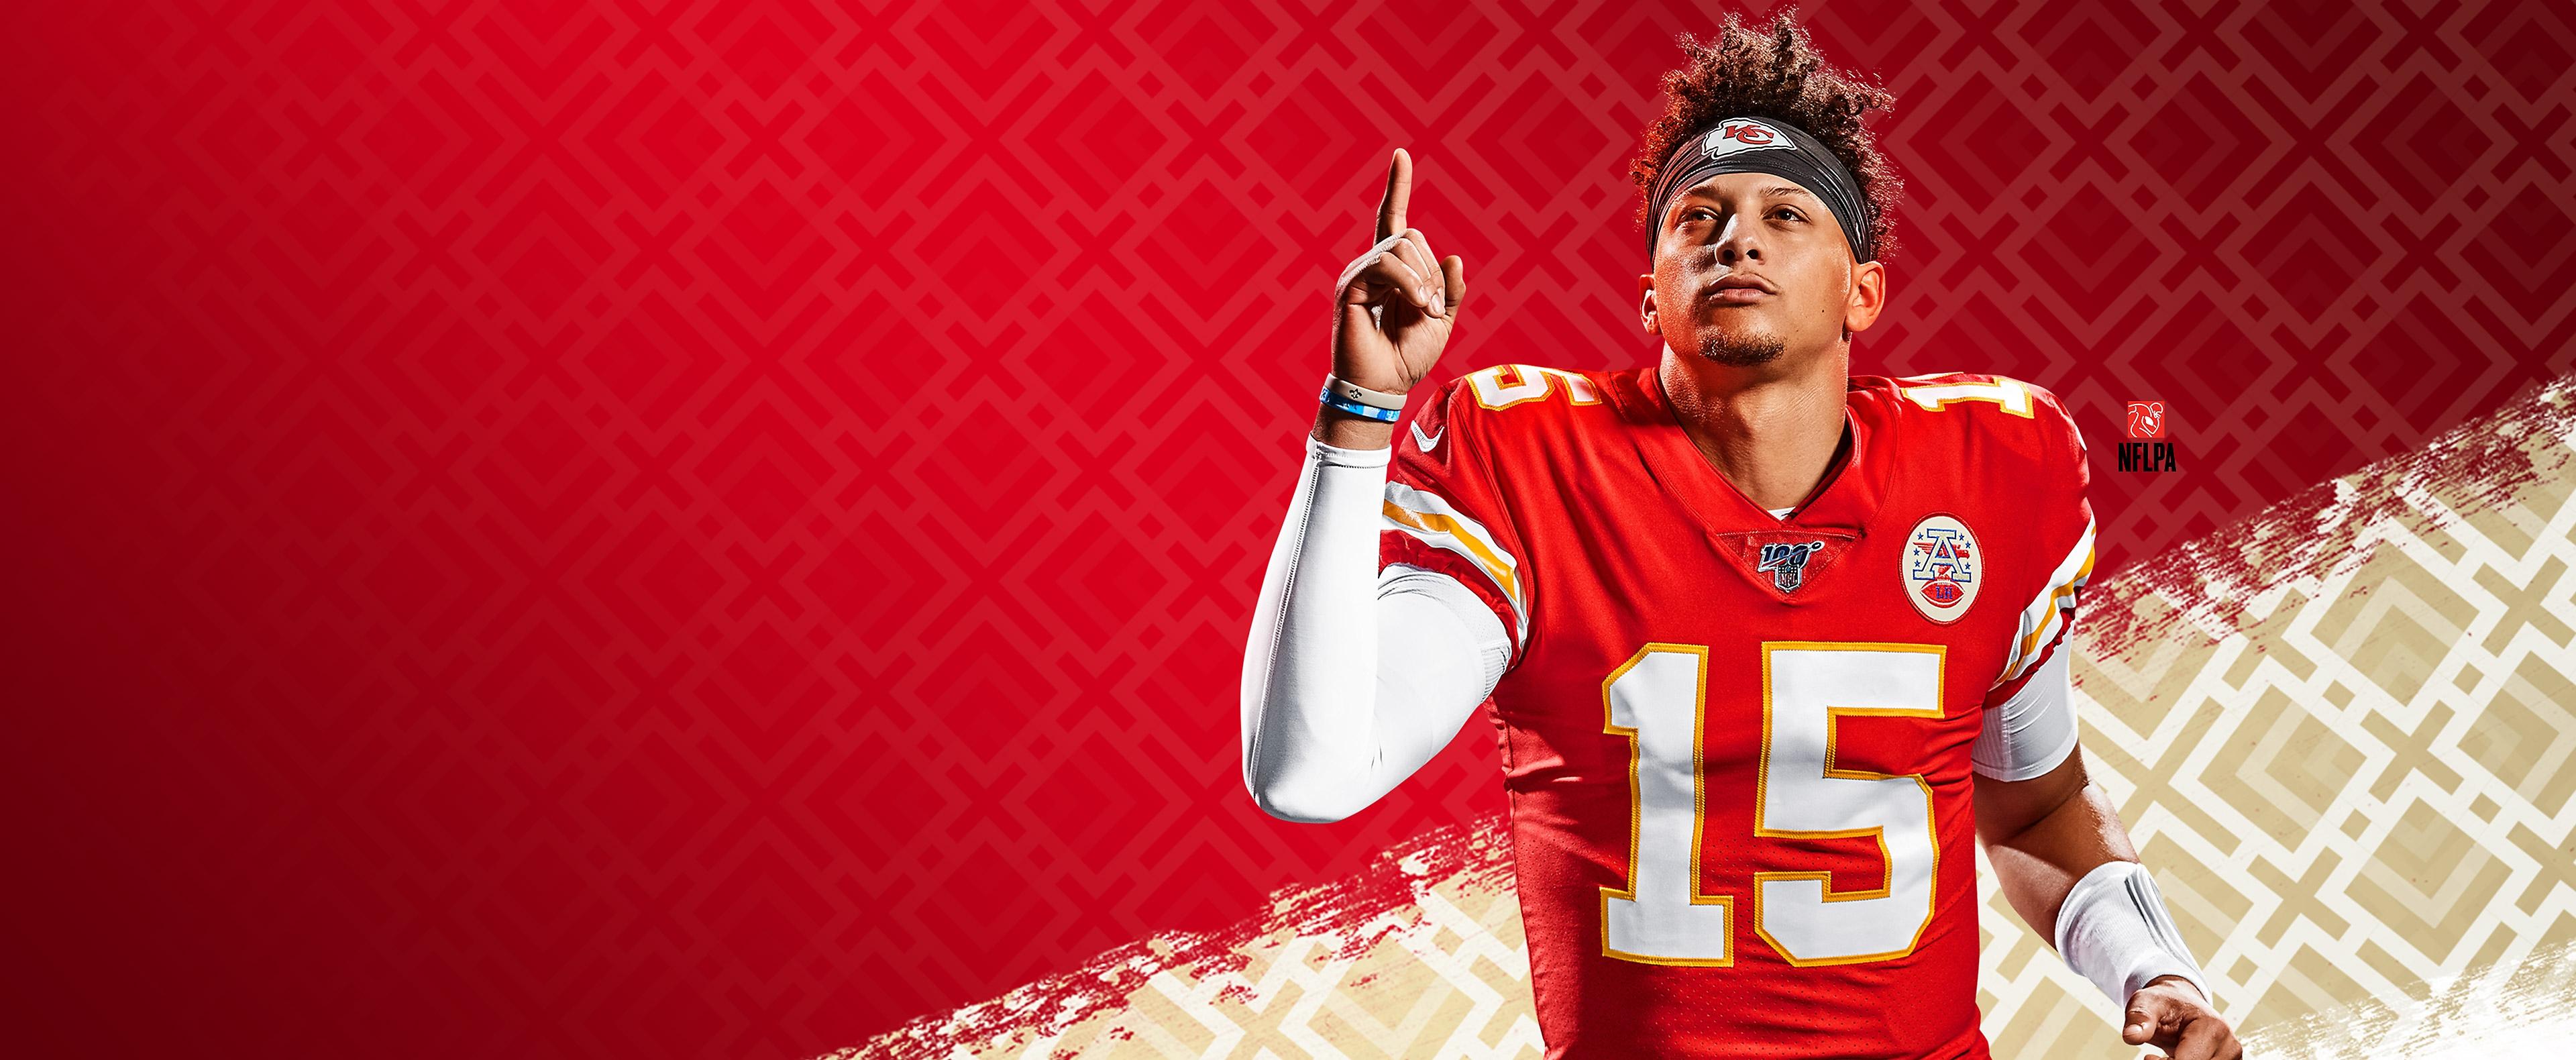 Héroe Madden NFL 20 - Arte de héroe